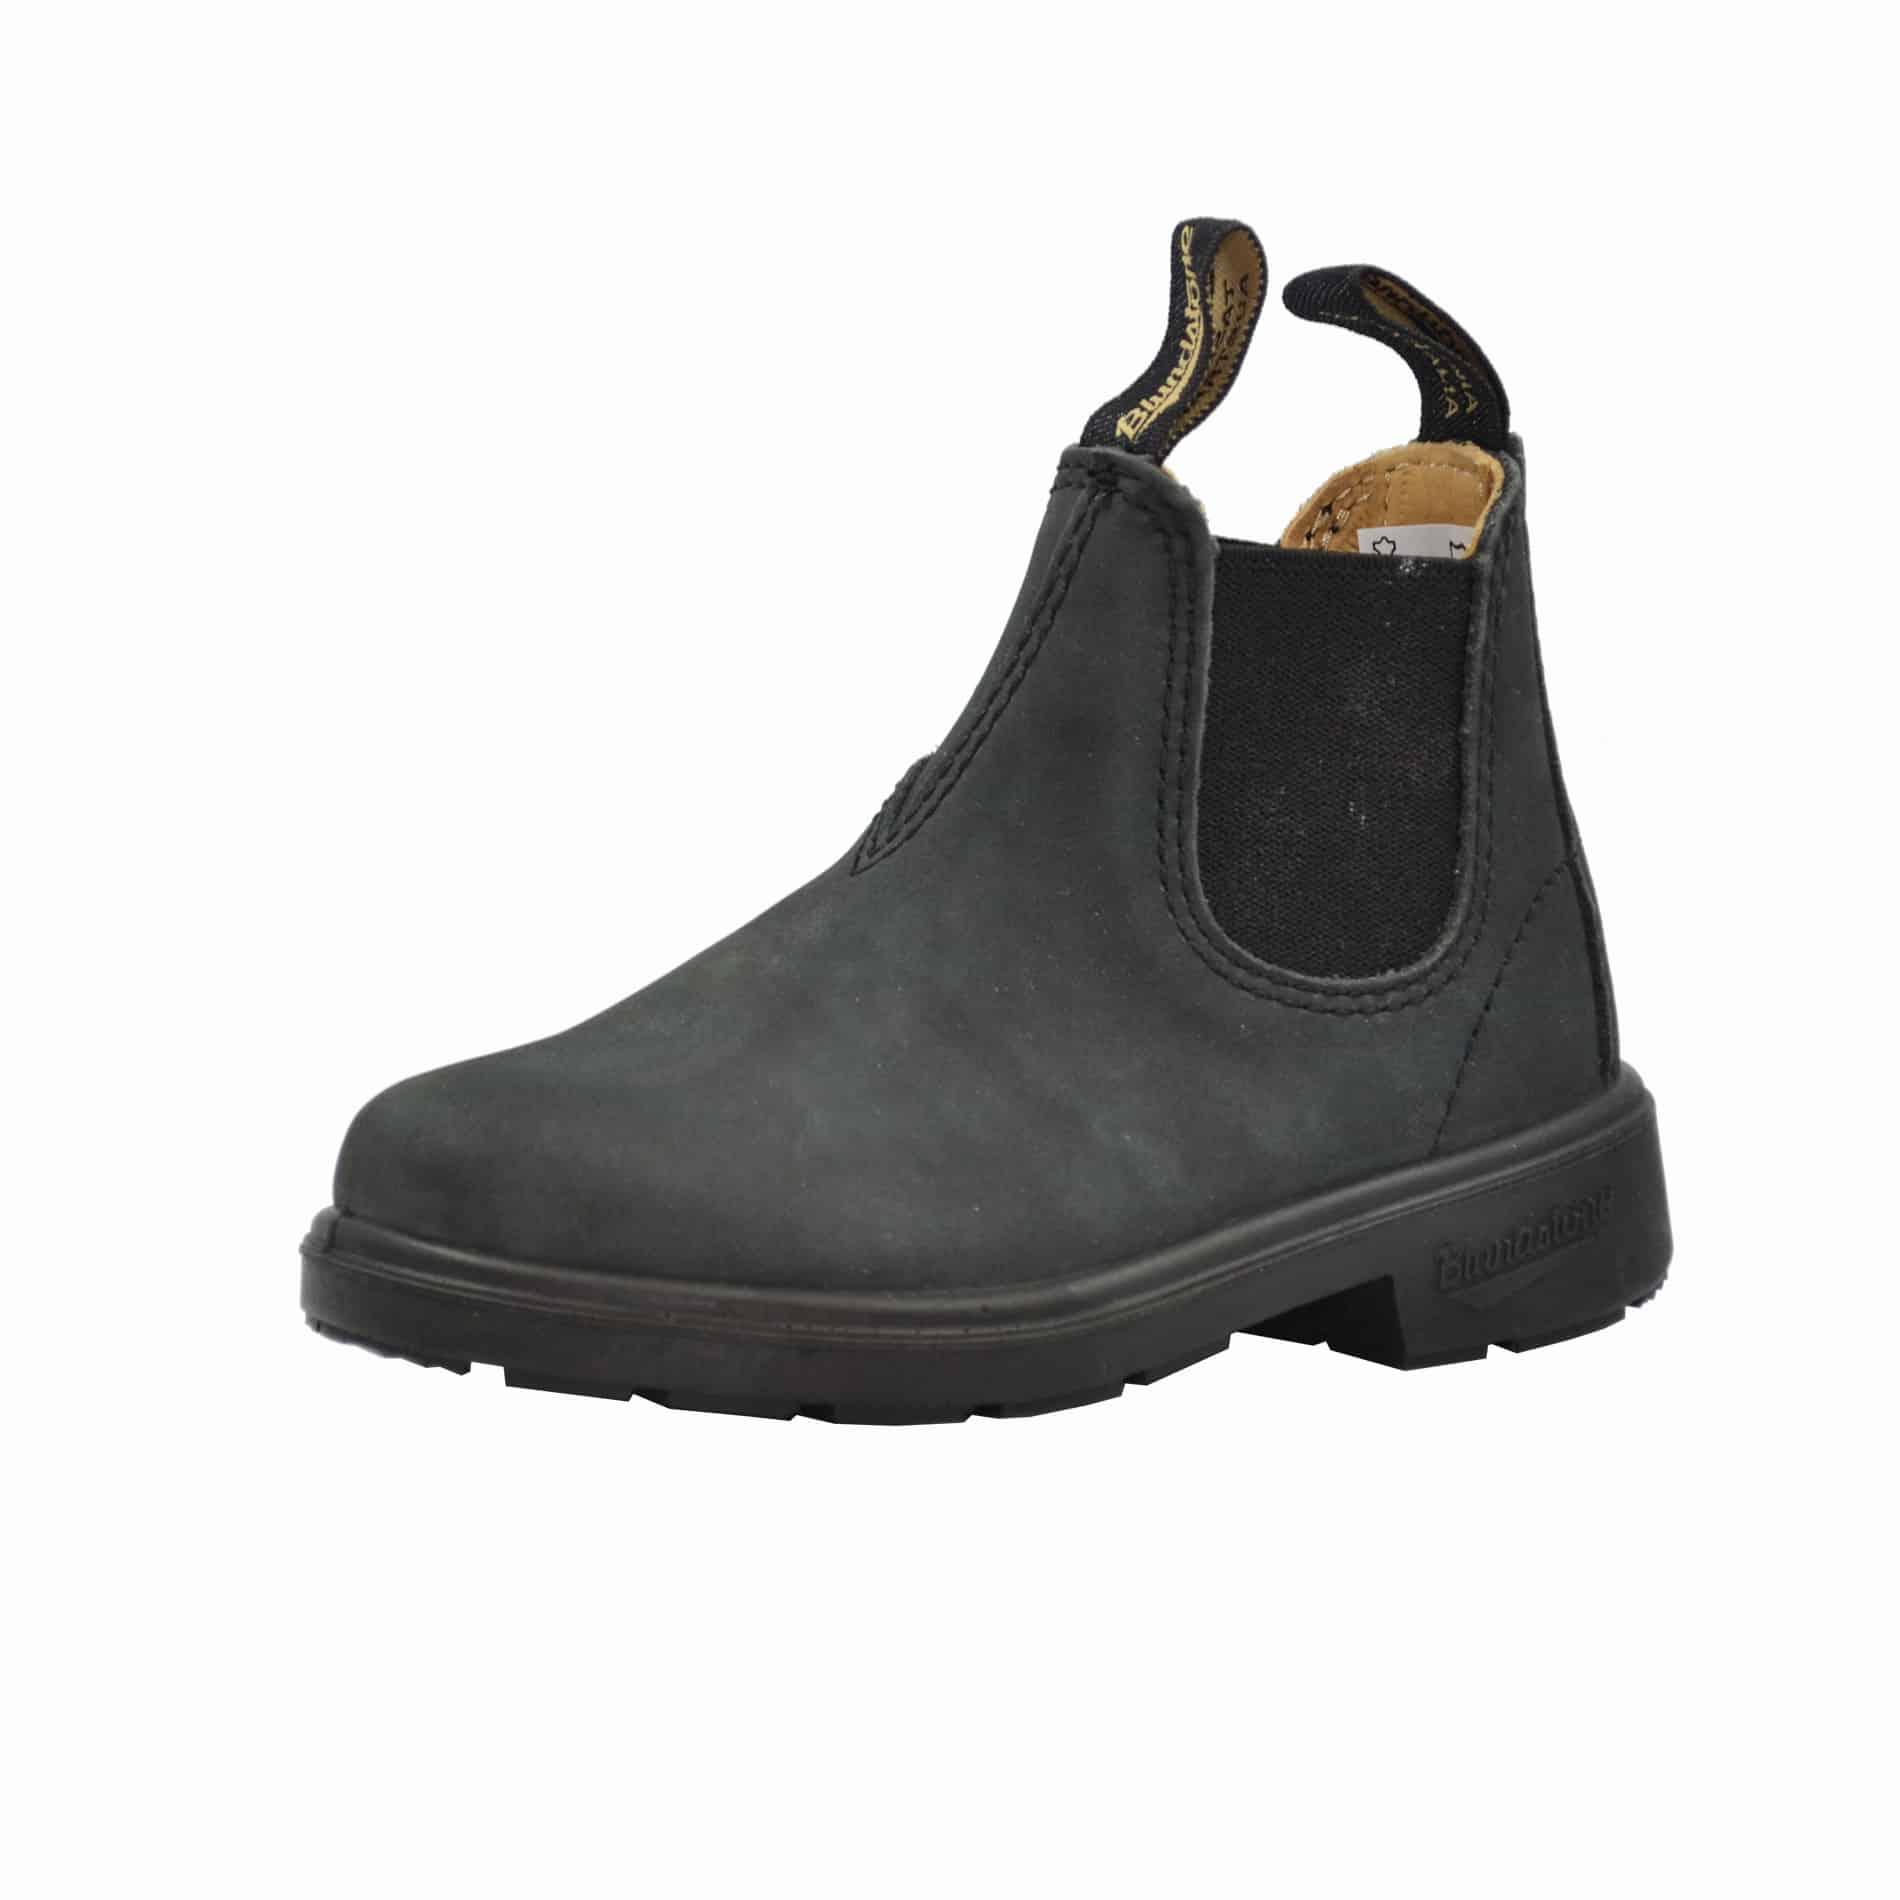 נעלי בלנסטון Blundstone KIDS 1325